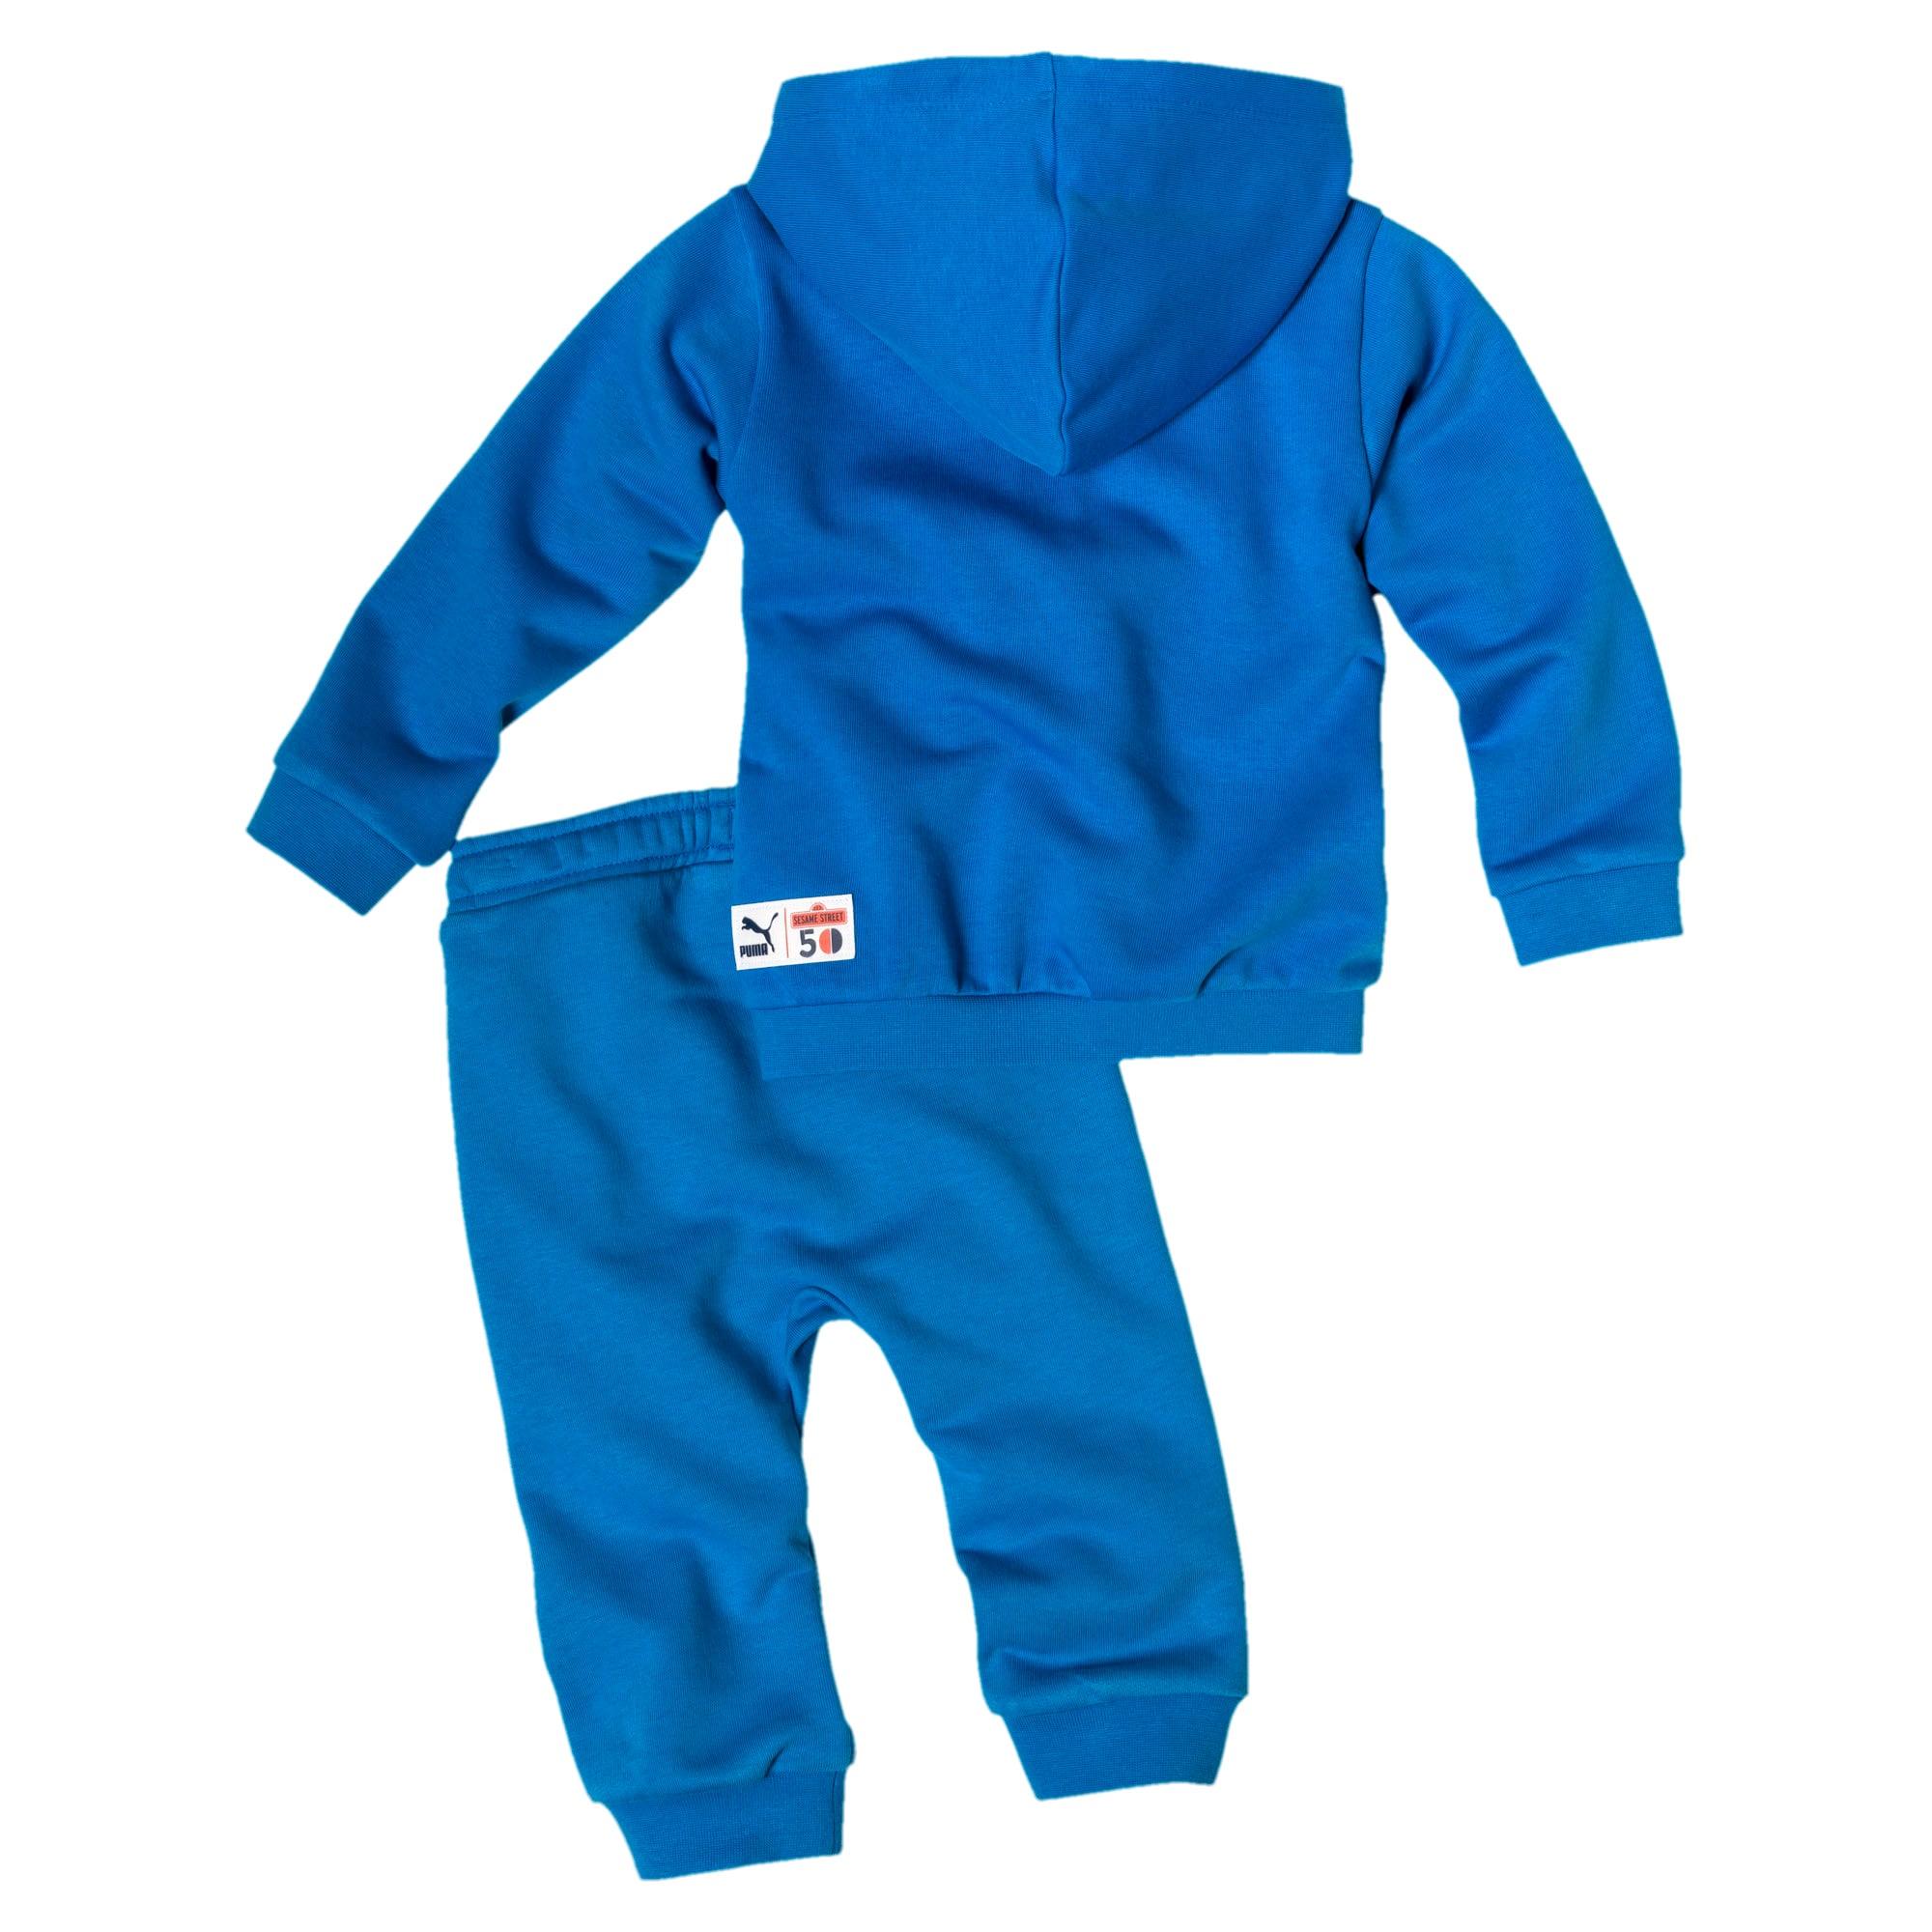 Thumbnail 2 of Sesame Street baby-trainingspak met capuchon voor jongens, Indigo Bunting, medium